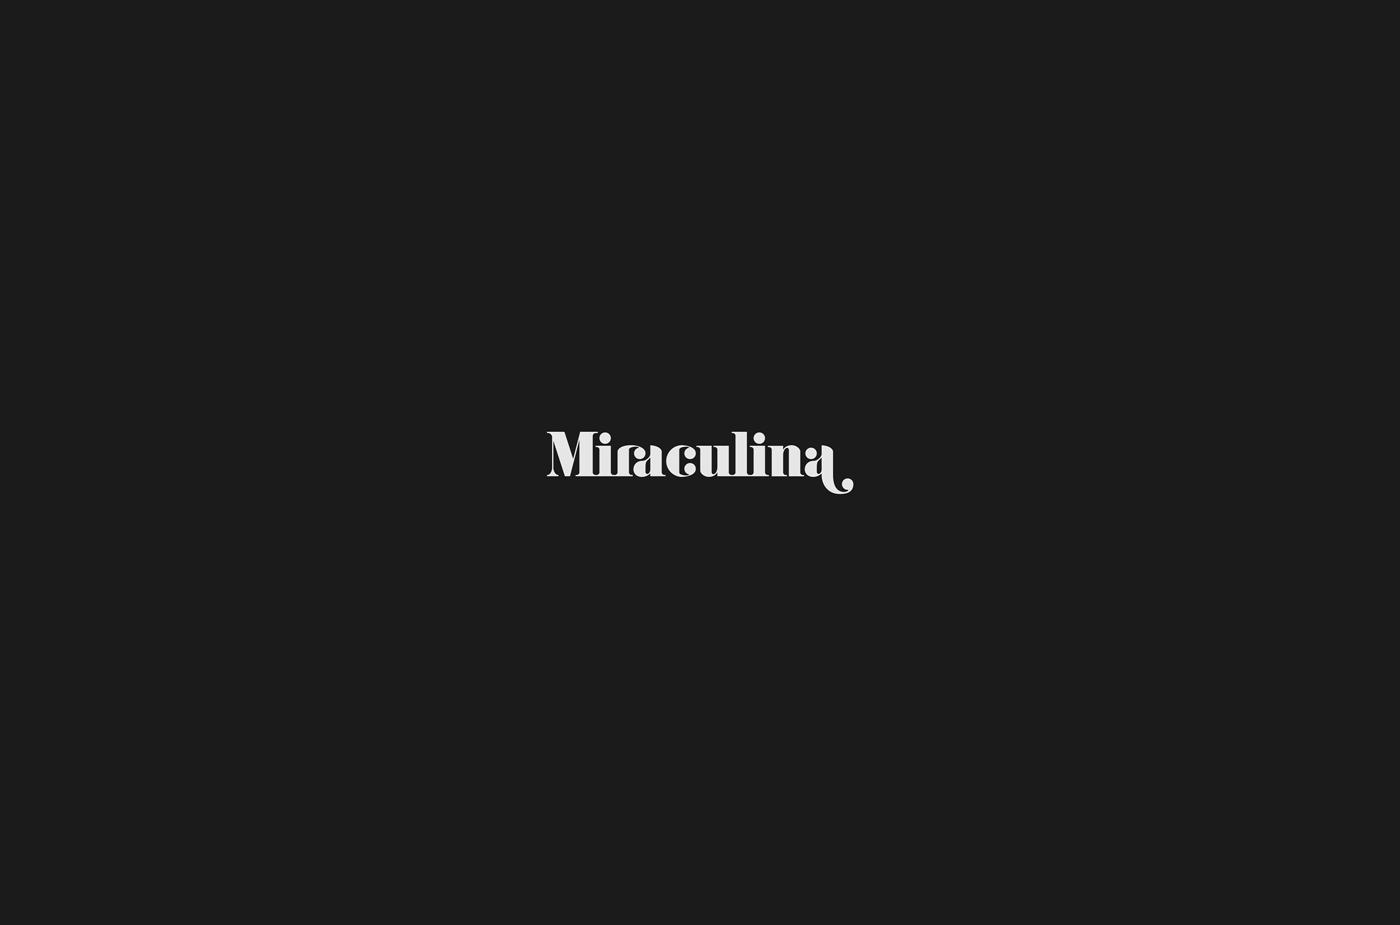 Miraculina.png